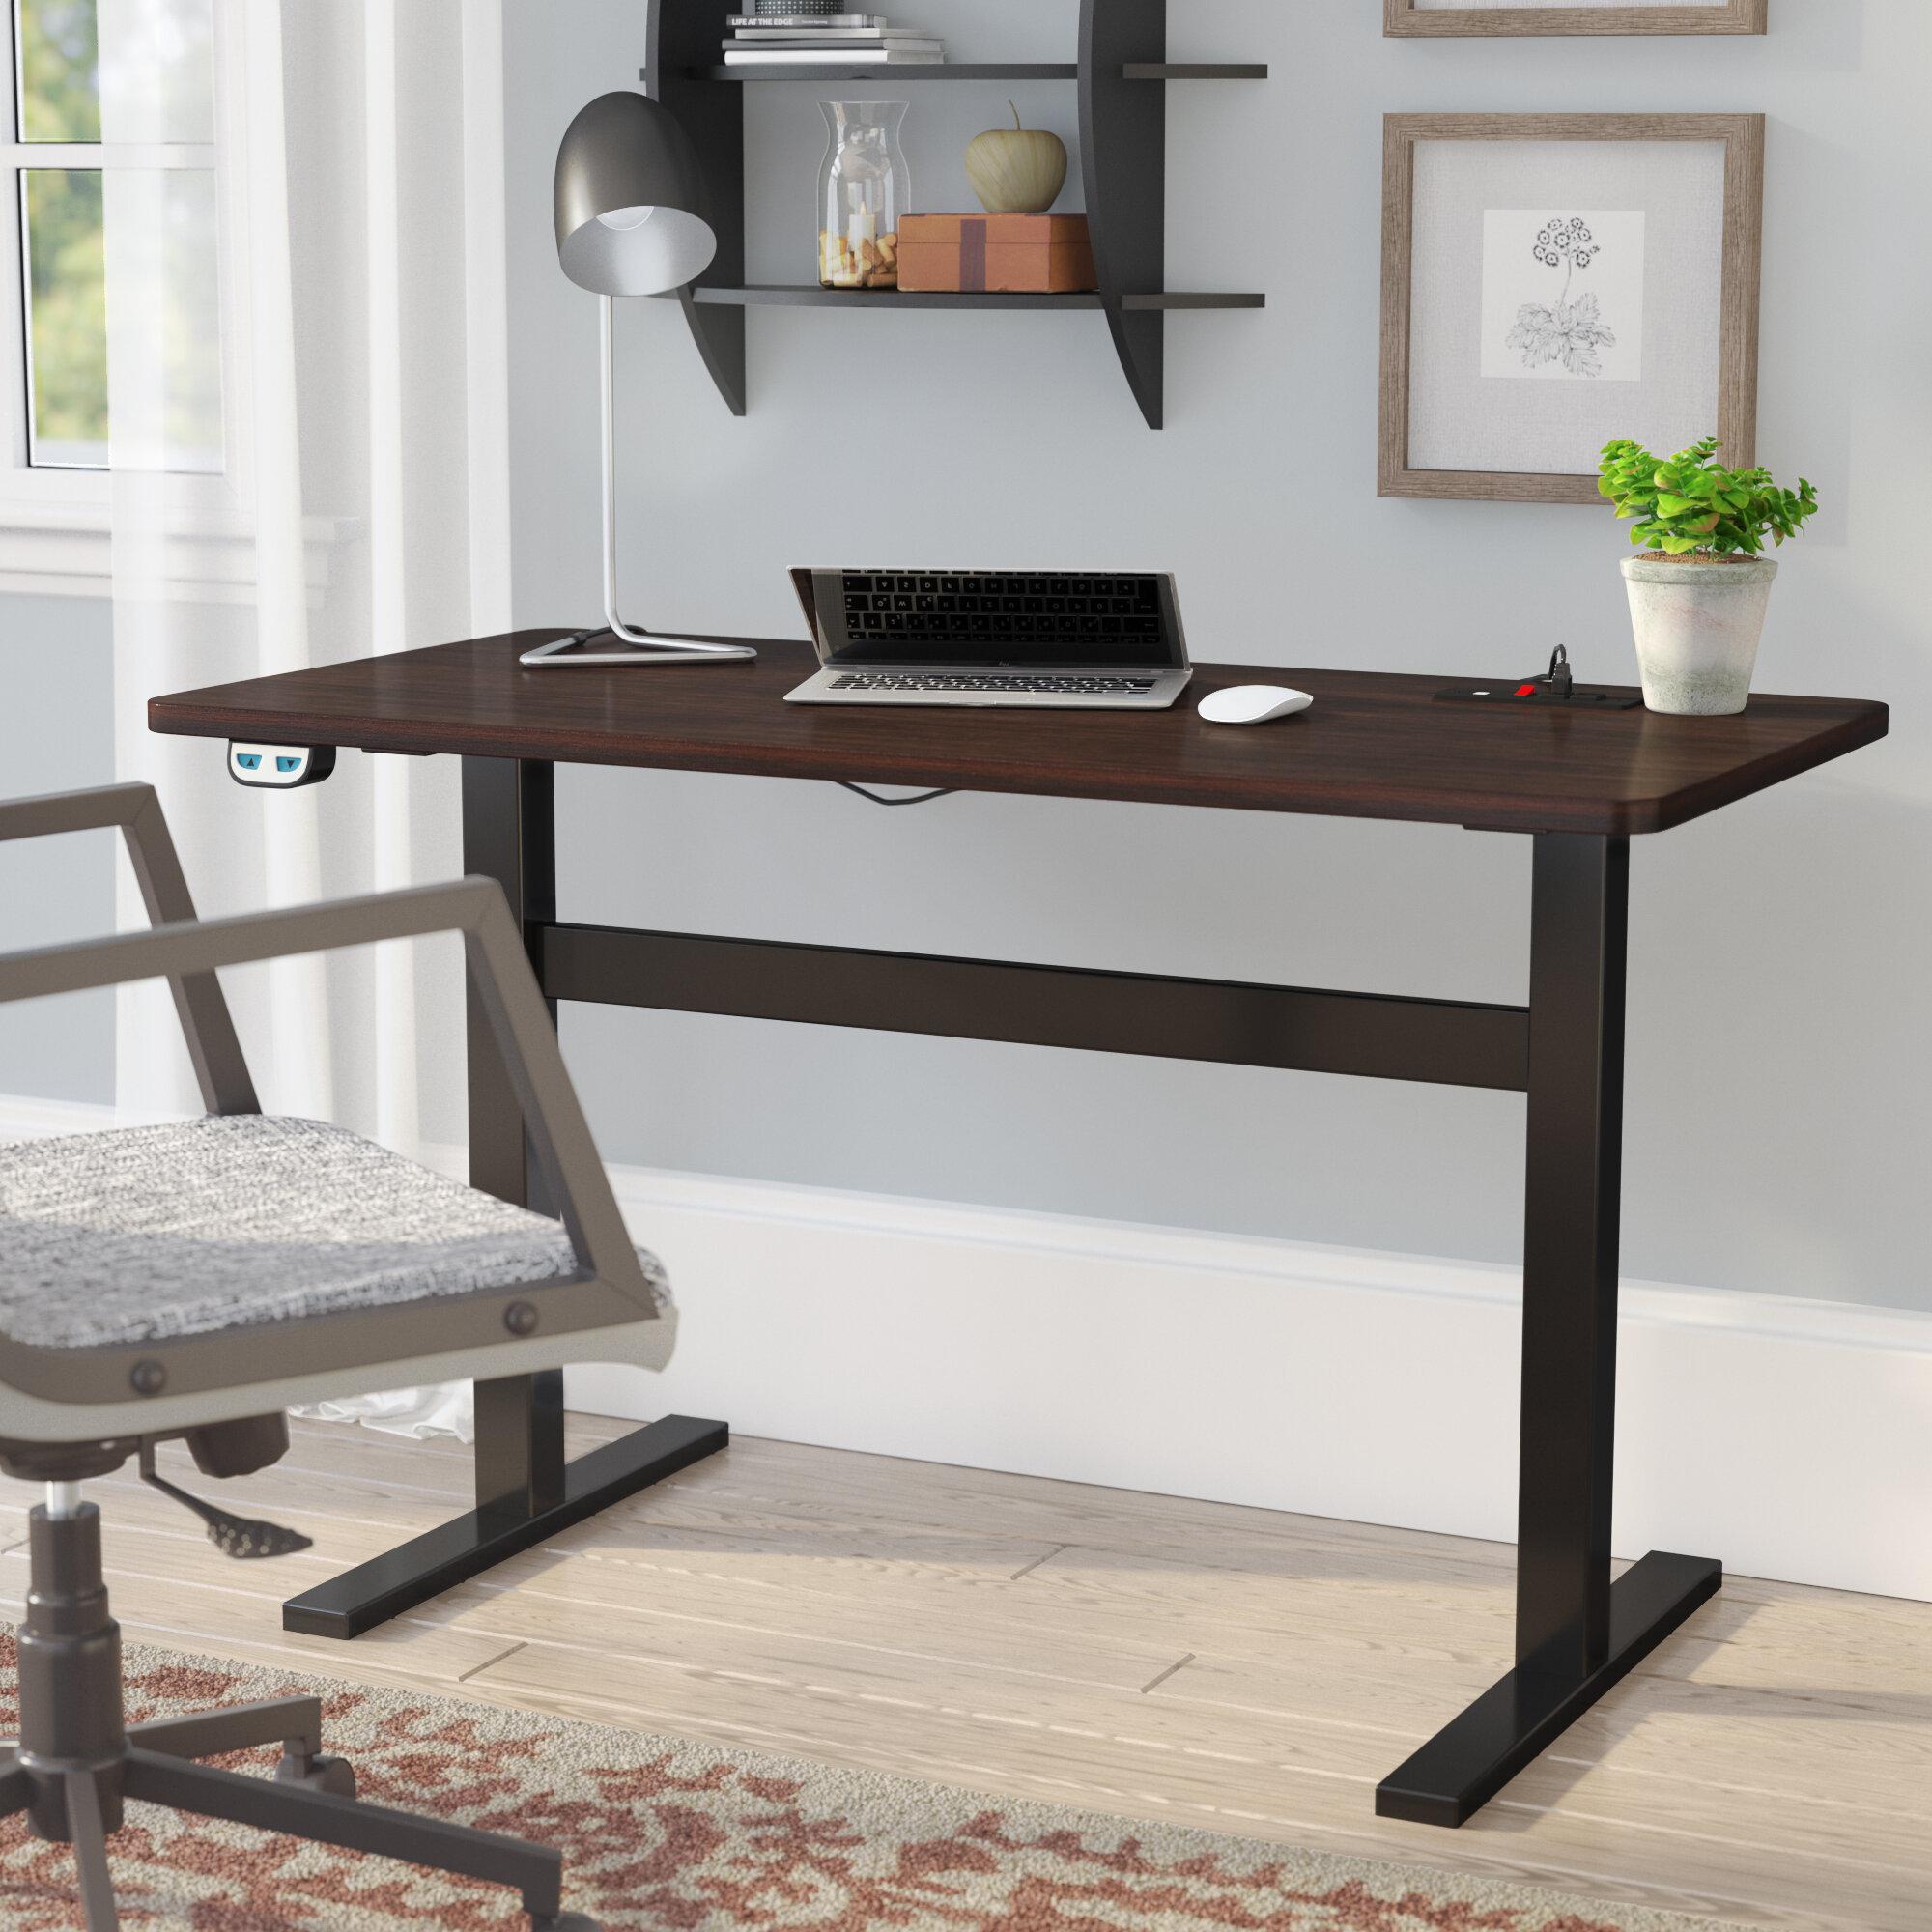 Surprising Valmont Adjustable Standing Desk Download Free Architecture Designs Embacsunscenecom